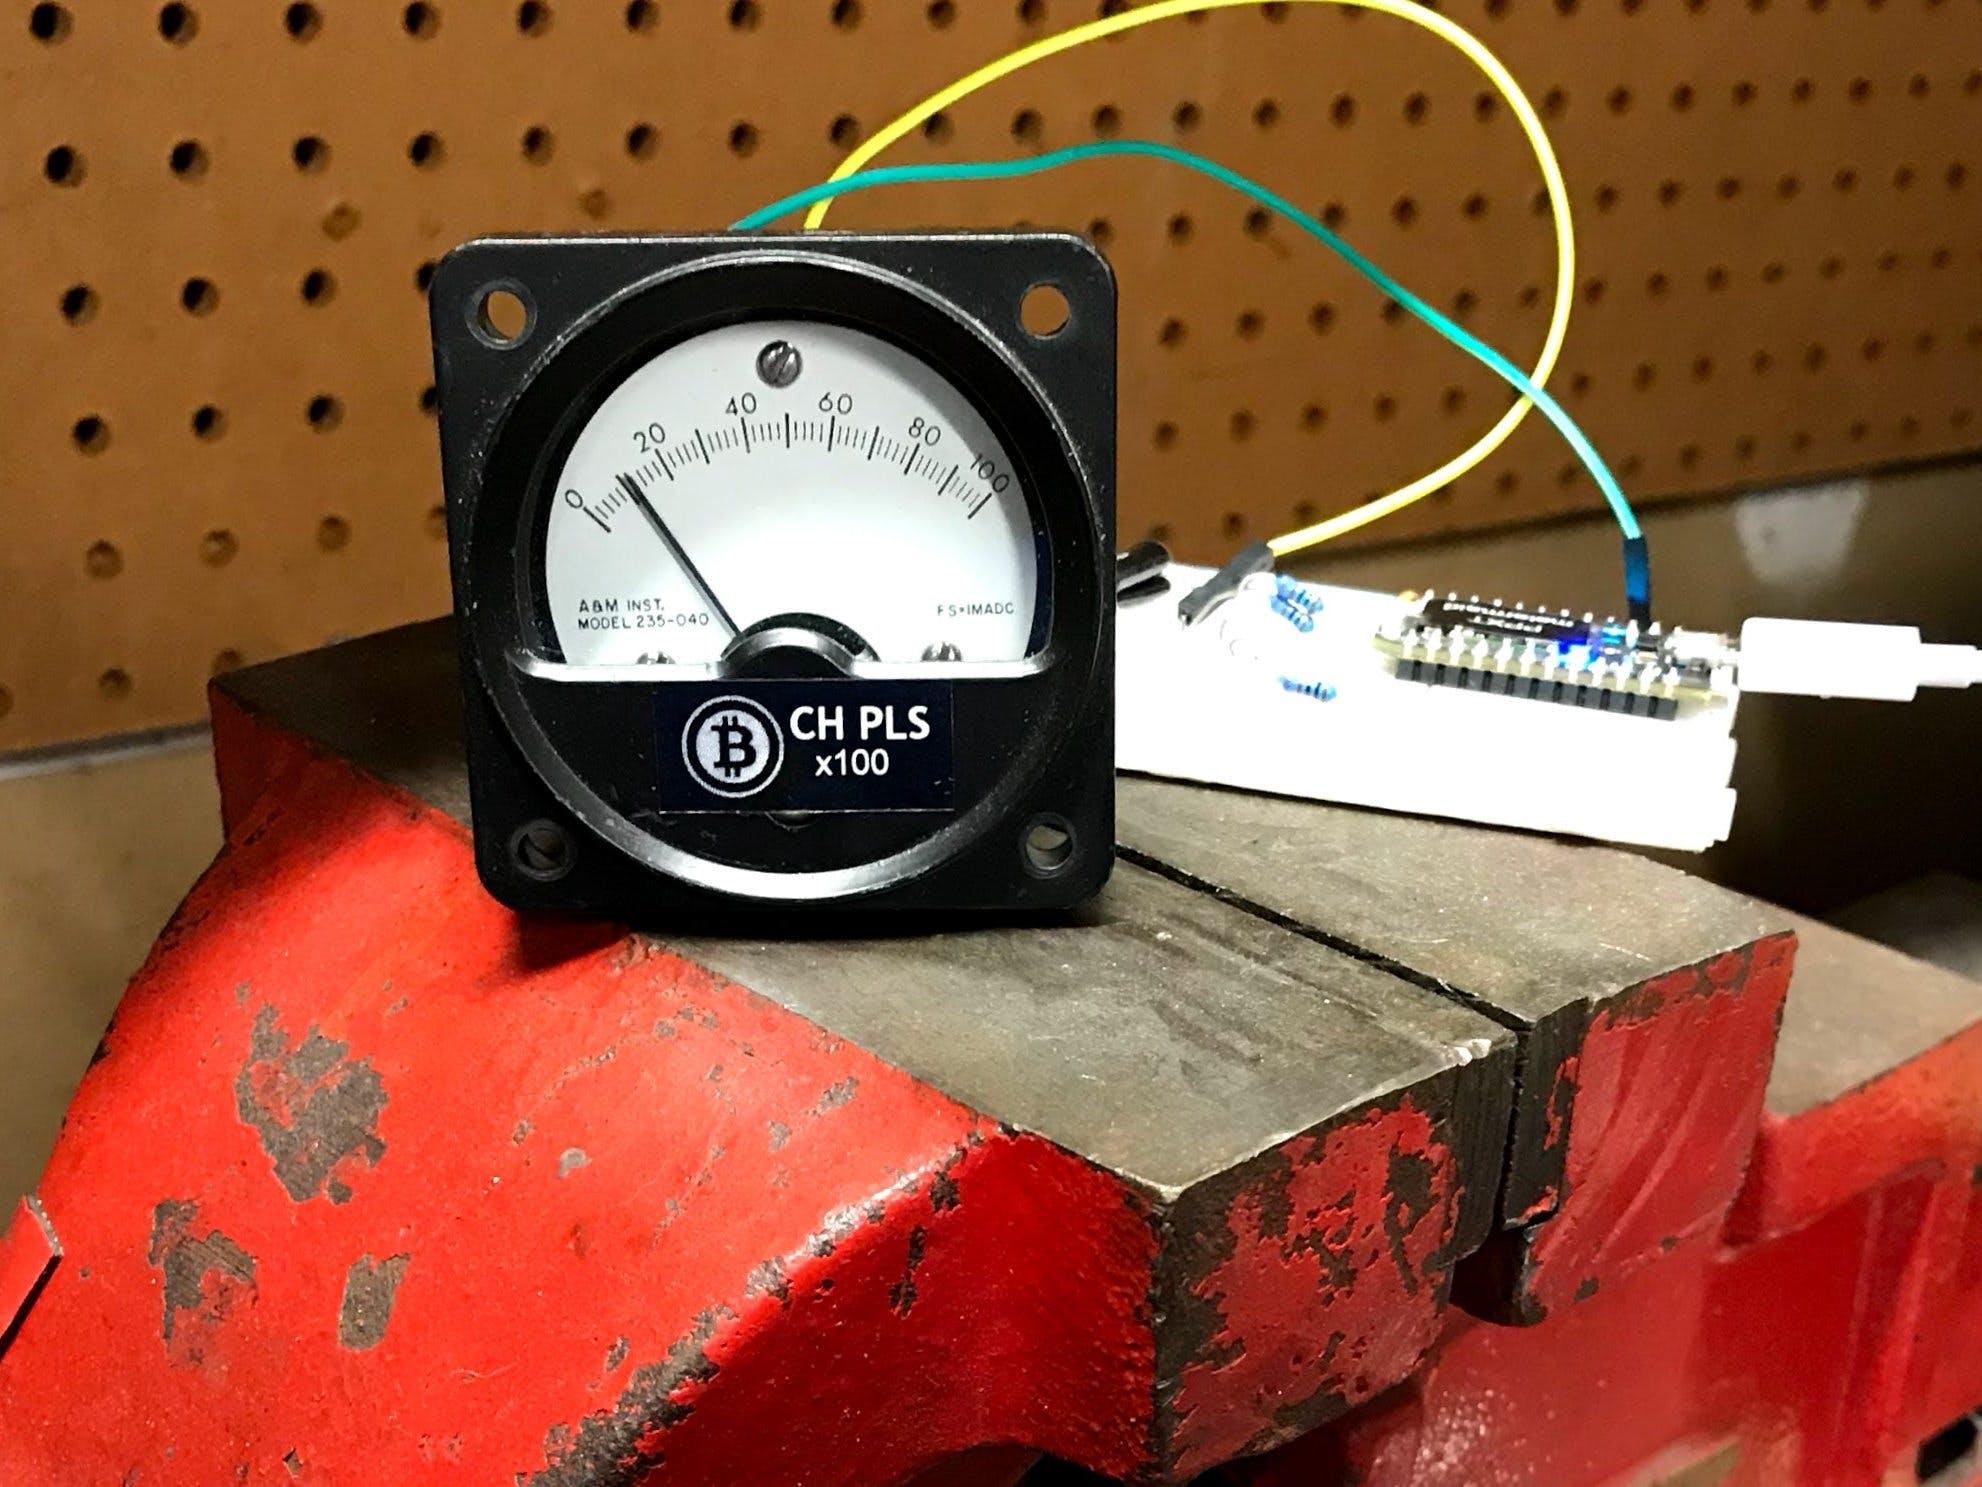 BCH PL$ - A Retro Analog Bitcoin Cash Meter